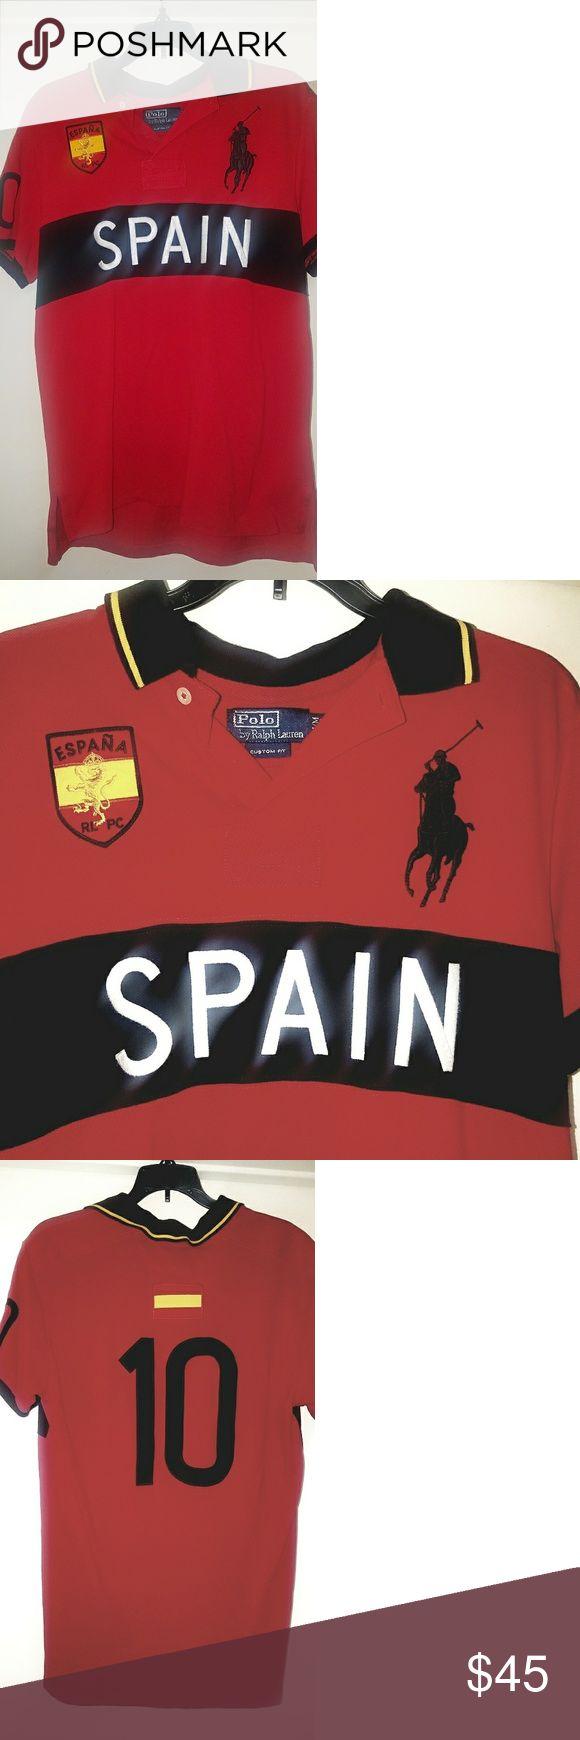 EUC - Polo Ralph Lauren Red 'Spain' Polo Shirt EUC - Red Polo Ralph Lauren 'Spain' polo shirt size Medium. Great condition. Previous buyer canceled the order. Polo by Ralph Lauren Shirts Polos